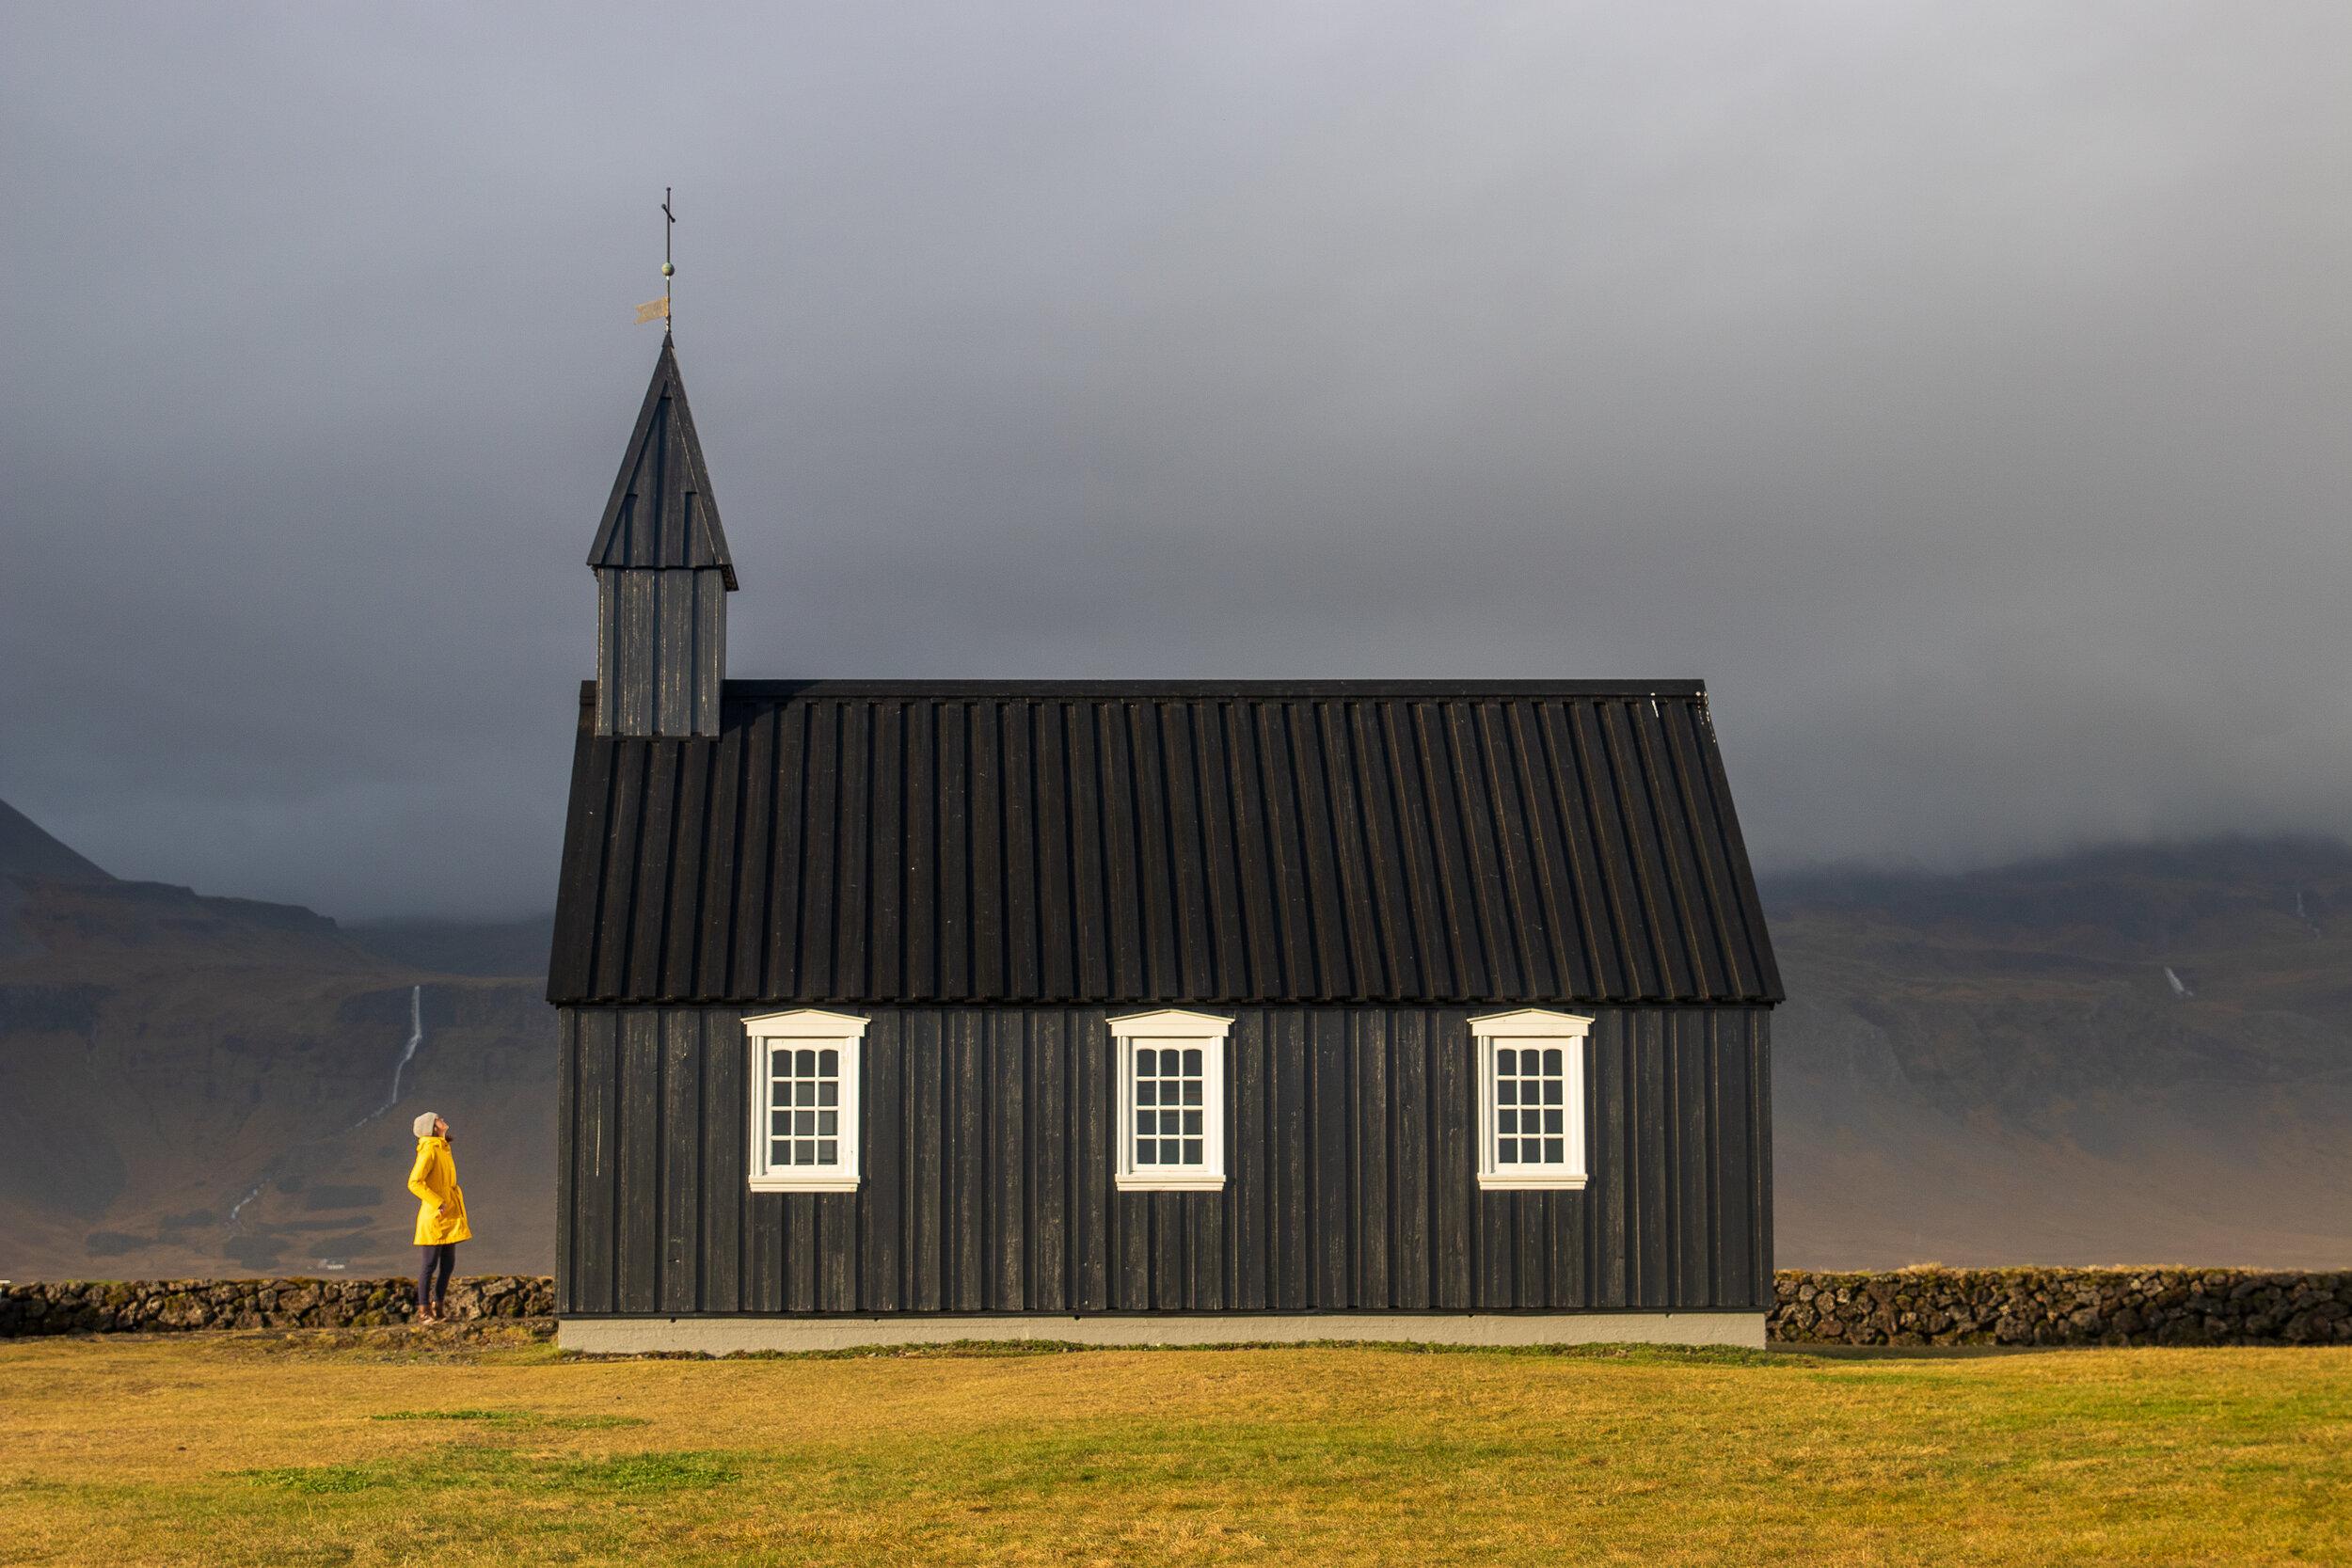 Búðakirkja (black church) dating from the 19th century in the town of Búðir.